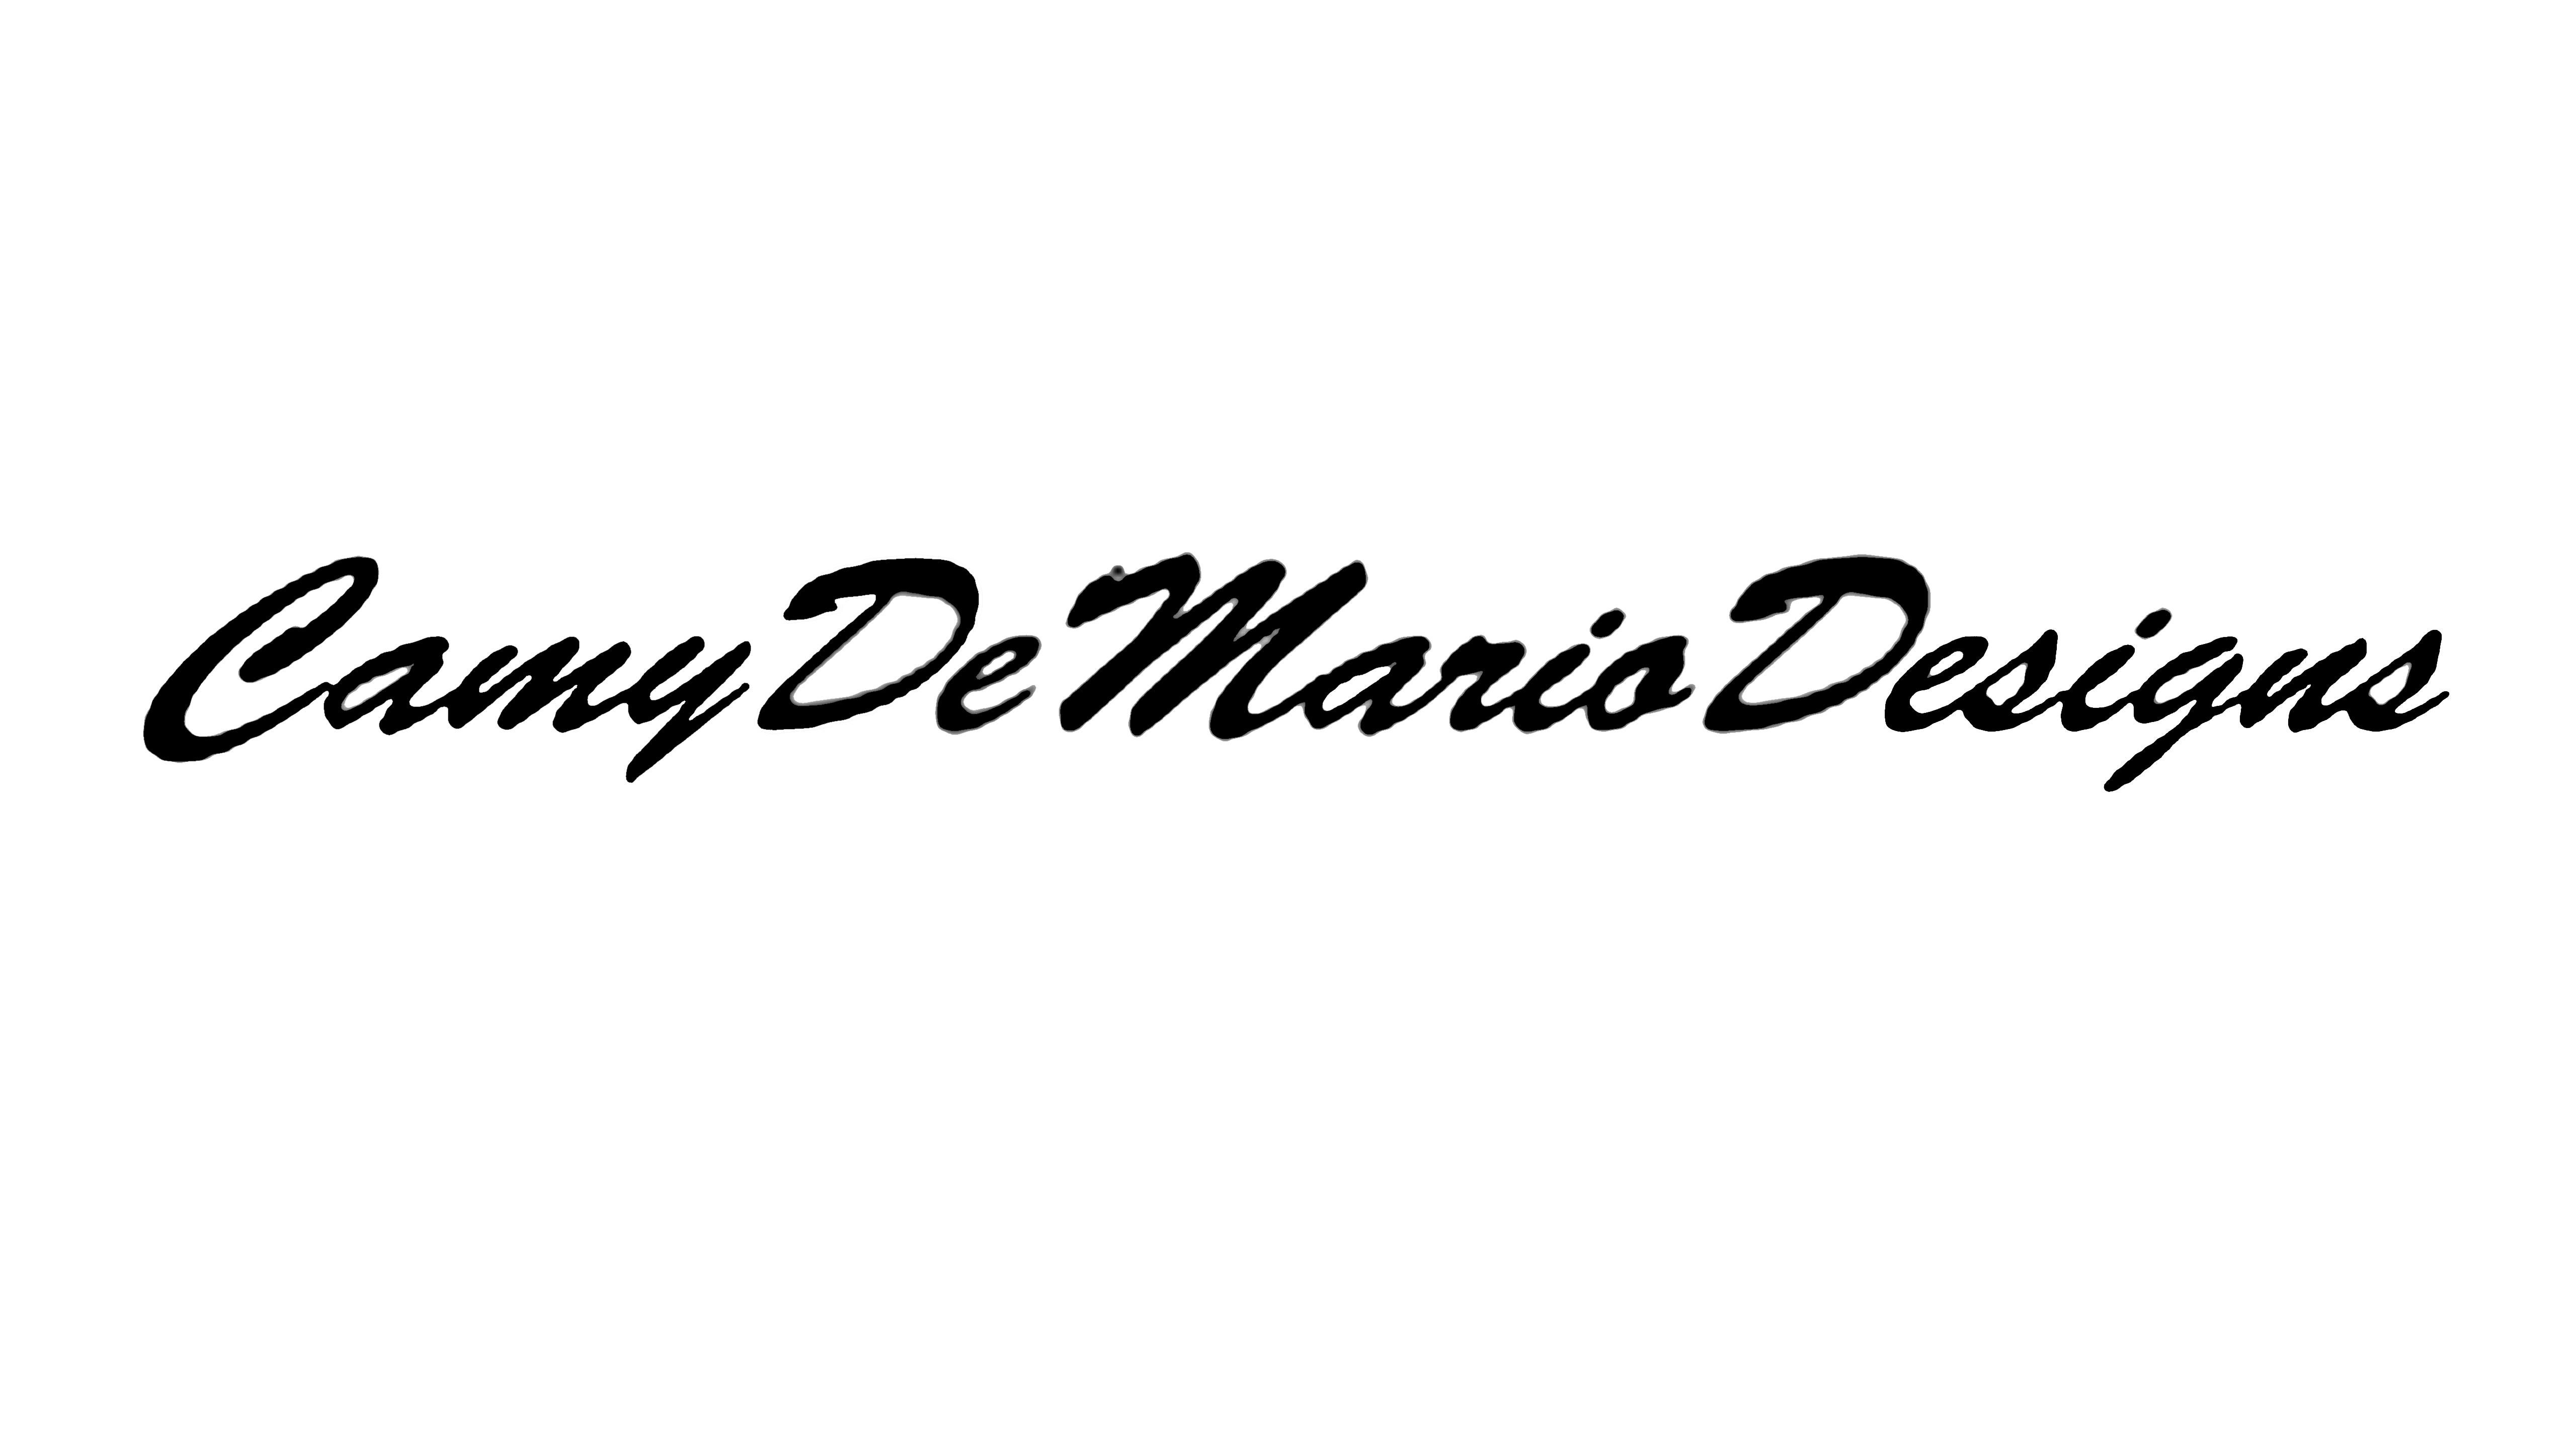 Camy De Mario's Signature